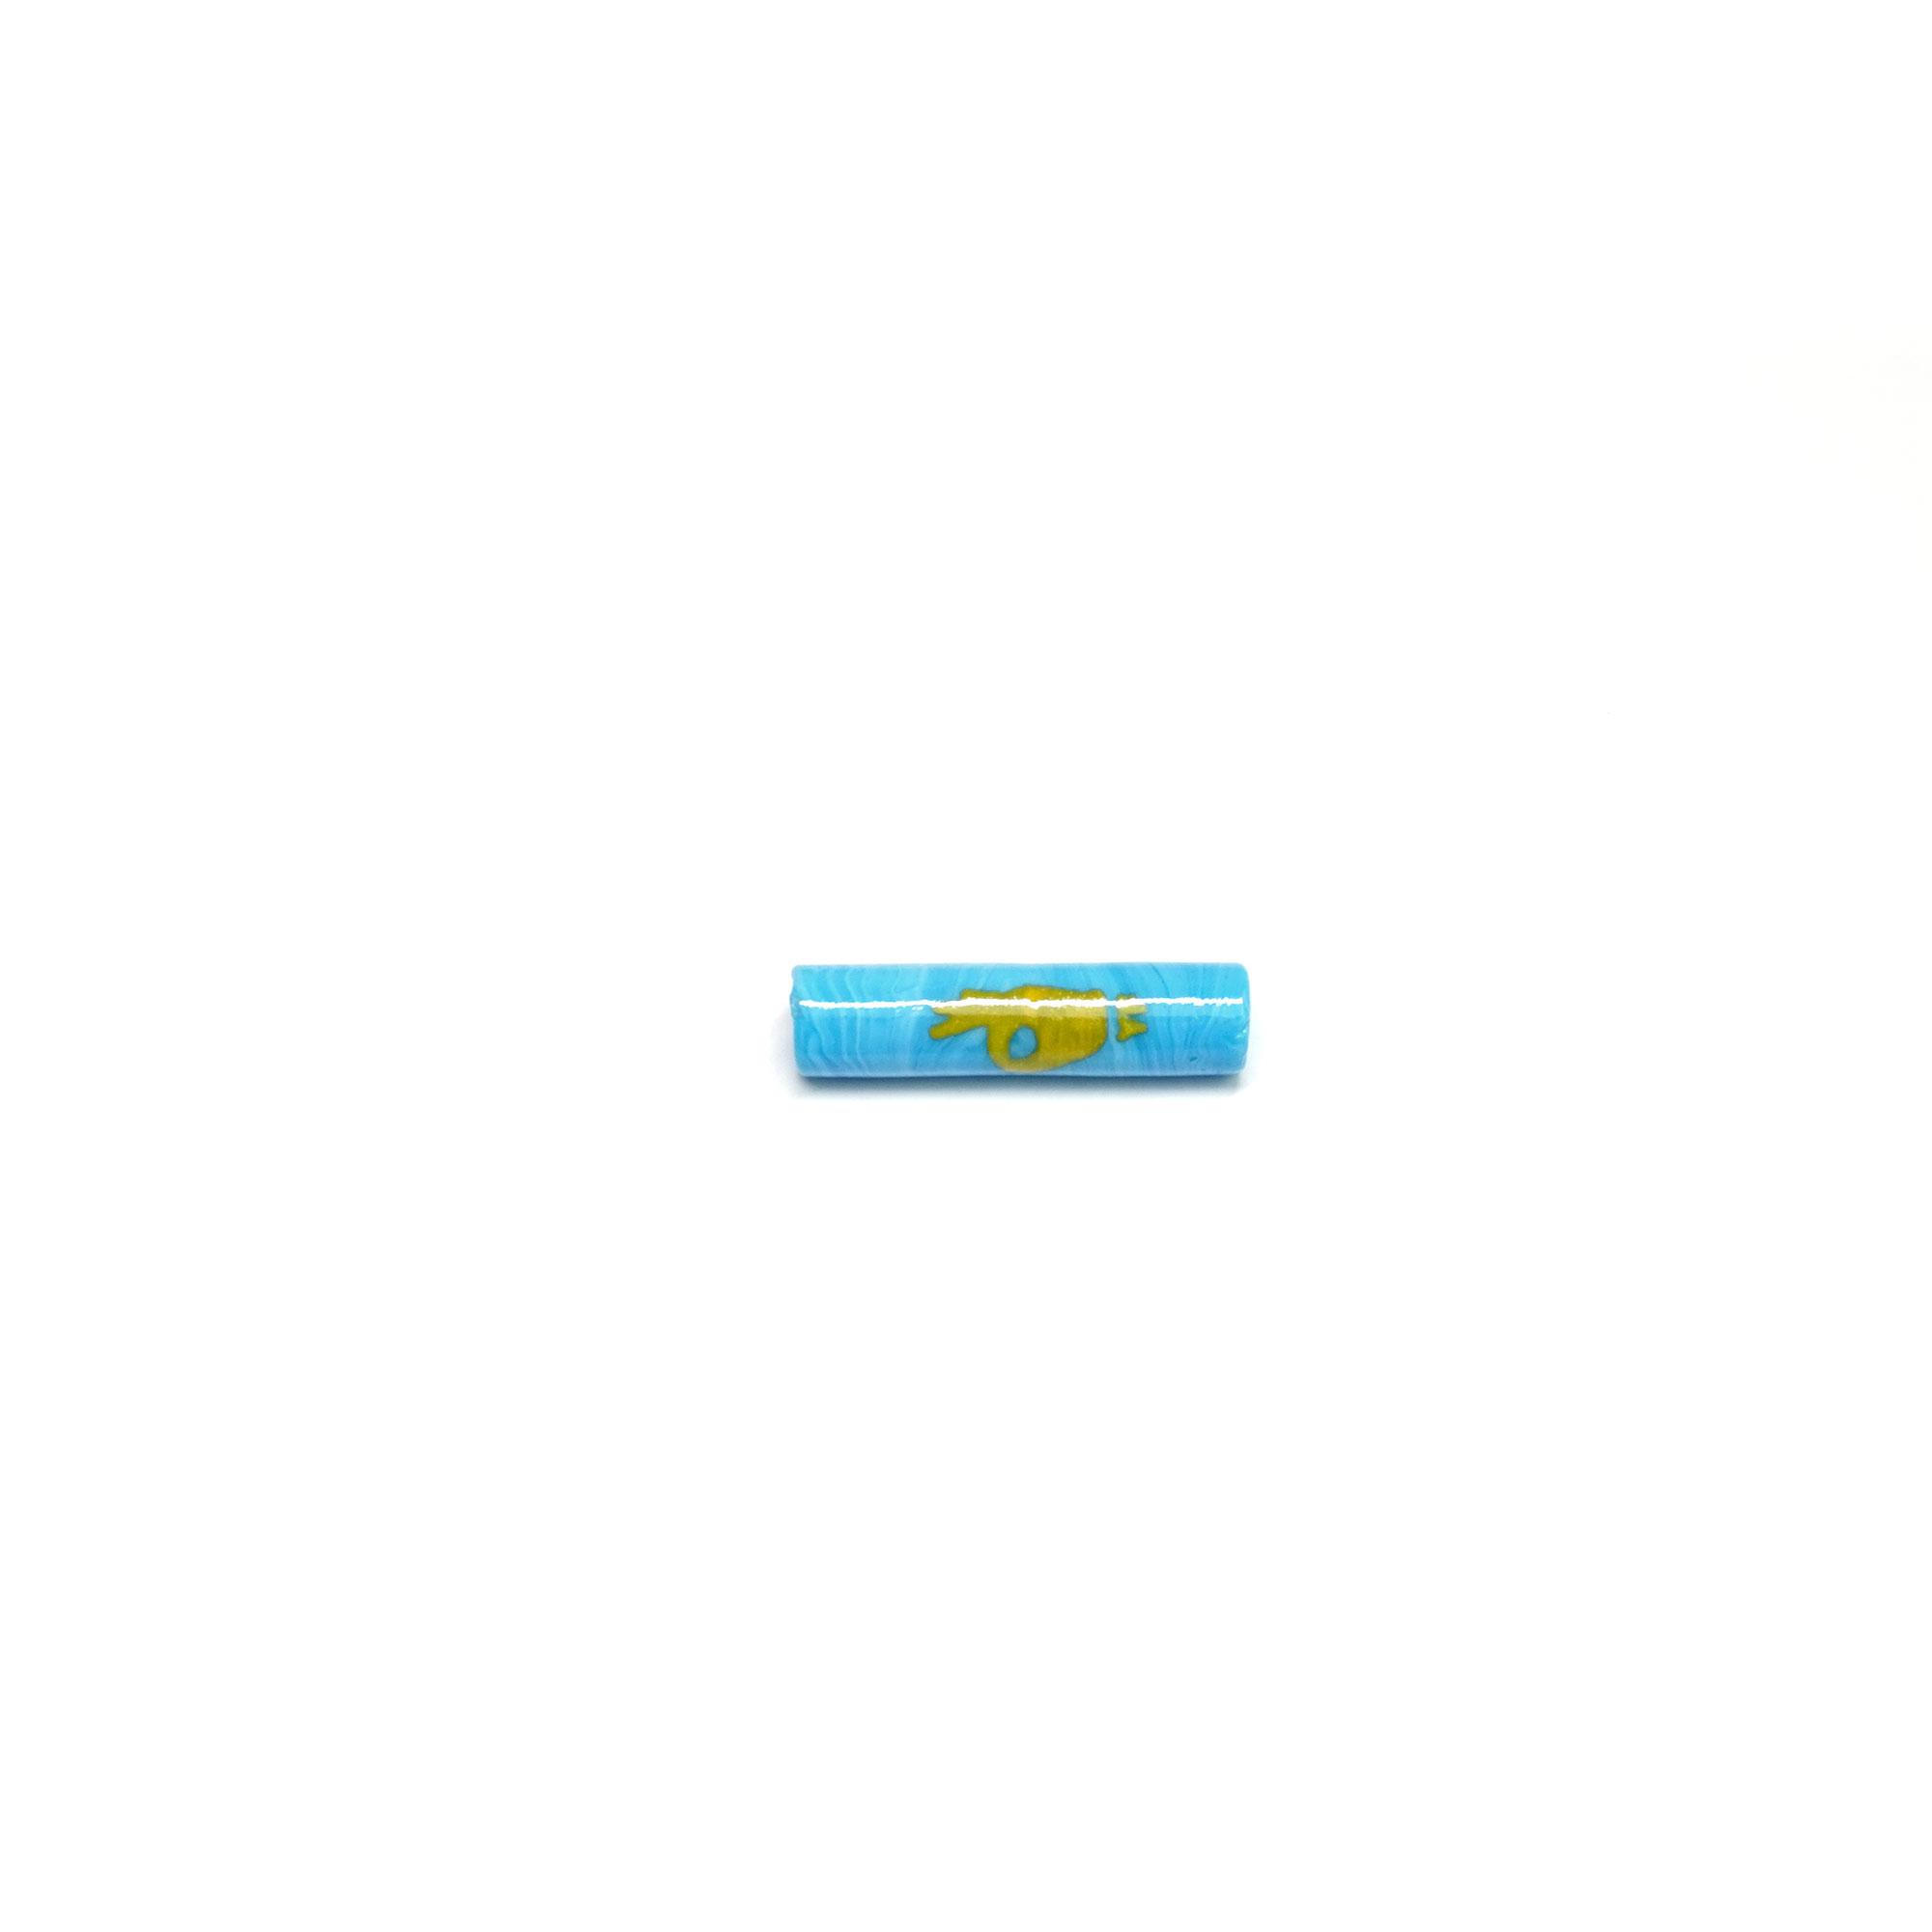 Piteira de Murano Yellow Finger 7mm